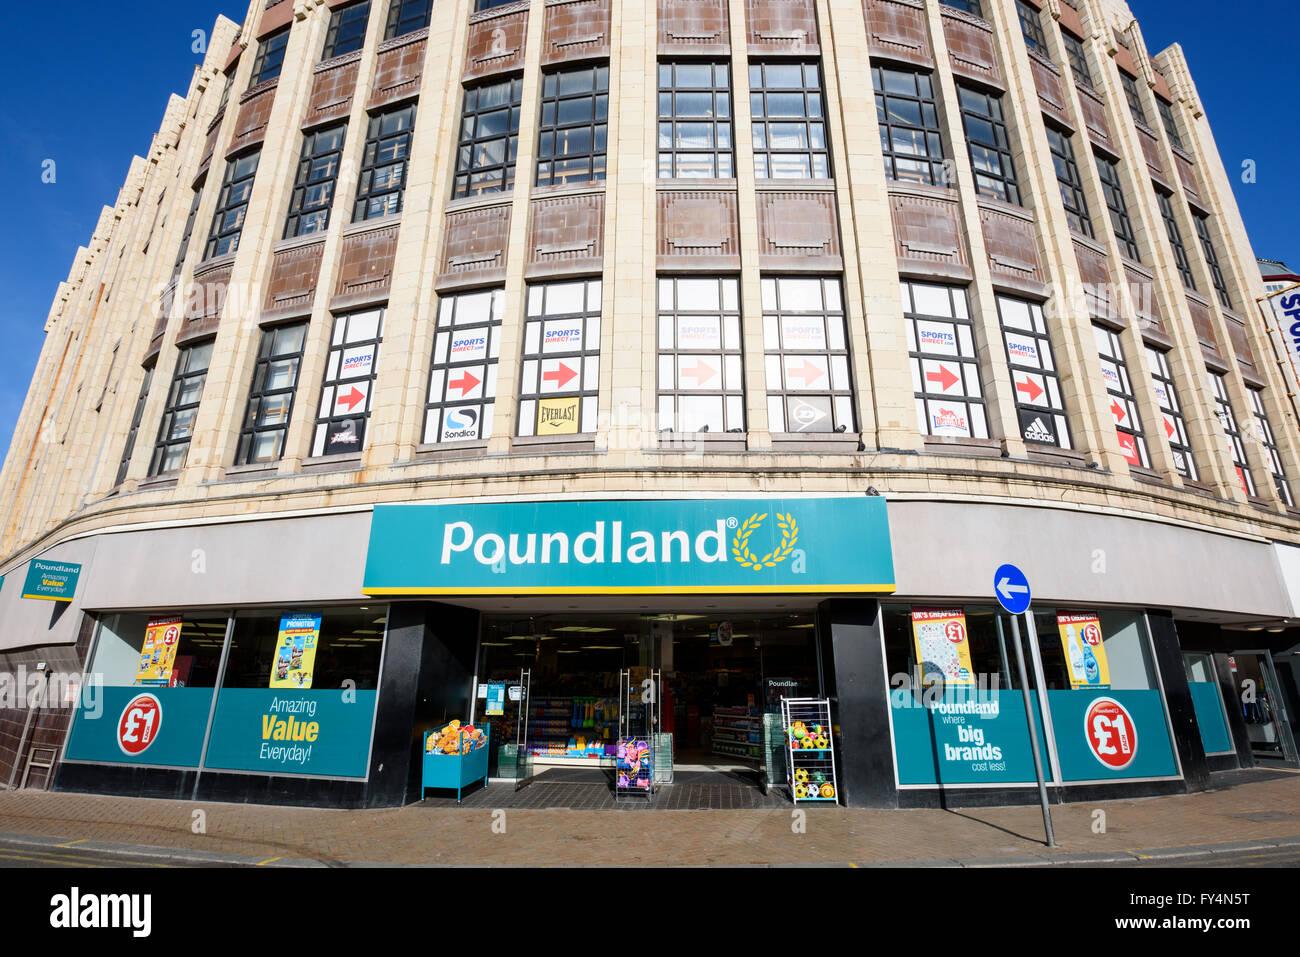 50ec74f7de466 The front of a large Poundland shop in Blackpool, Lancashire, UK ...